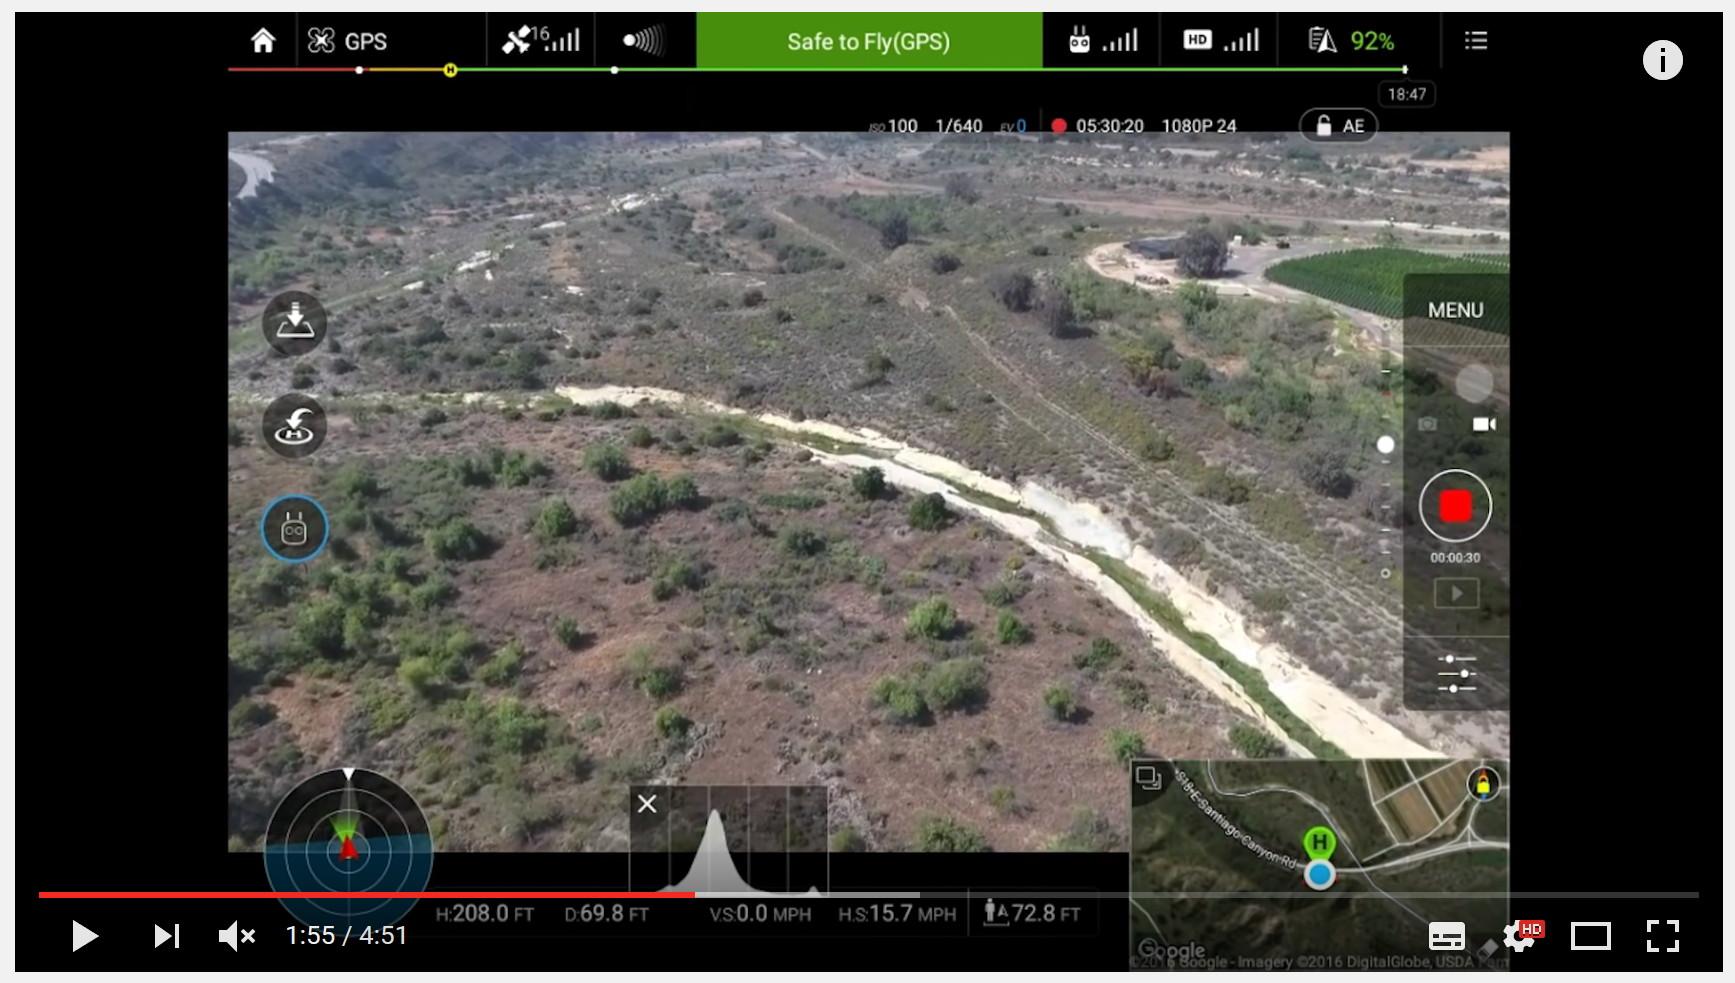 Minimap in DJI GO.jpg